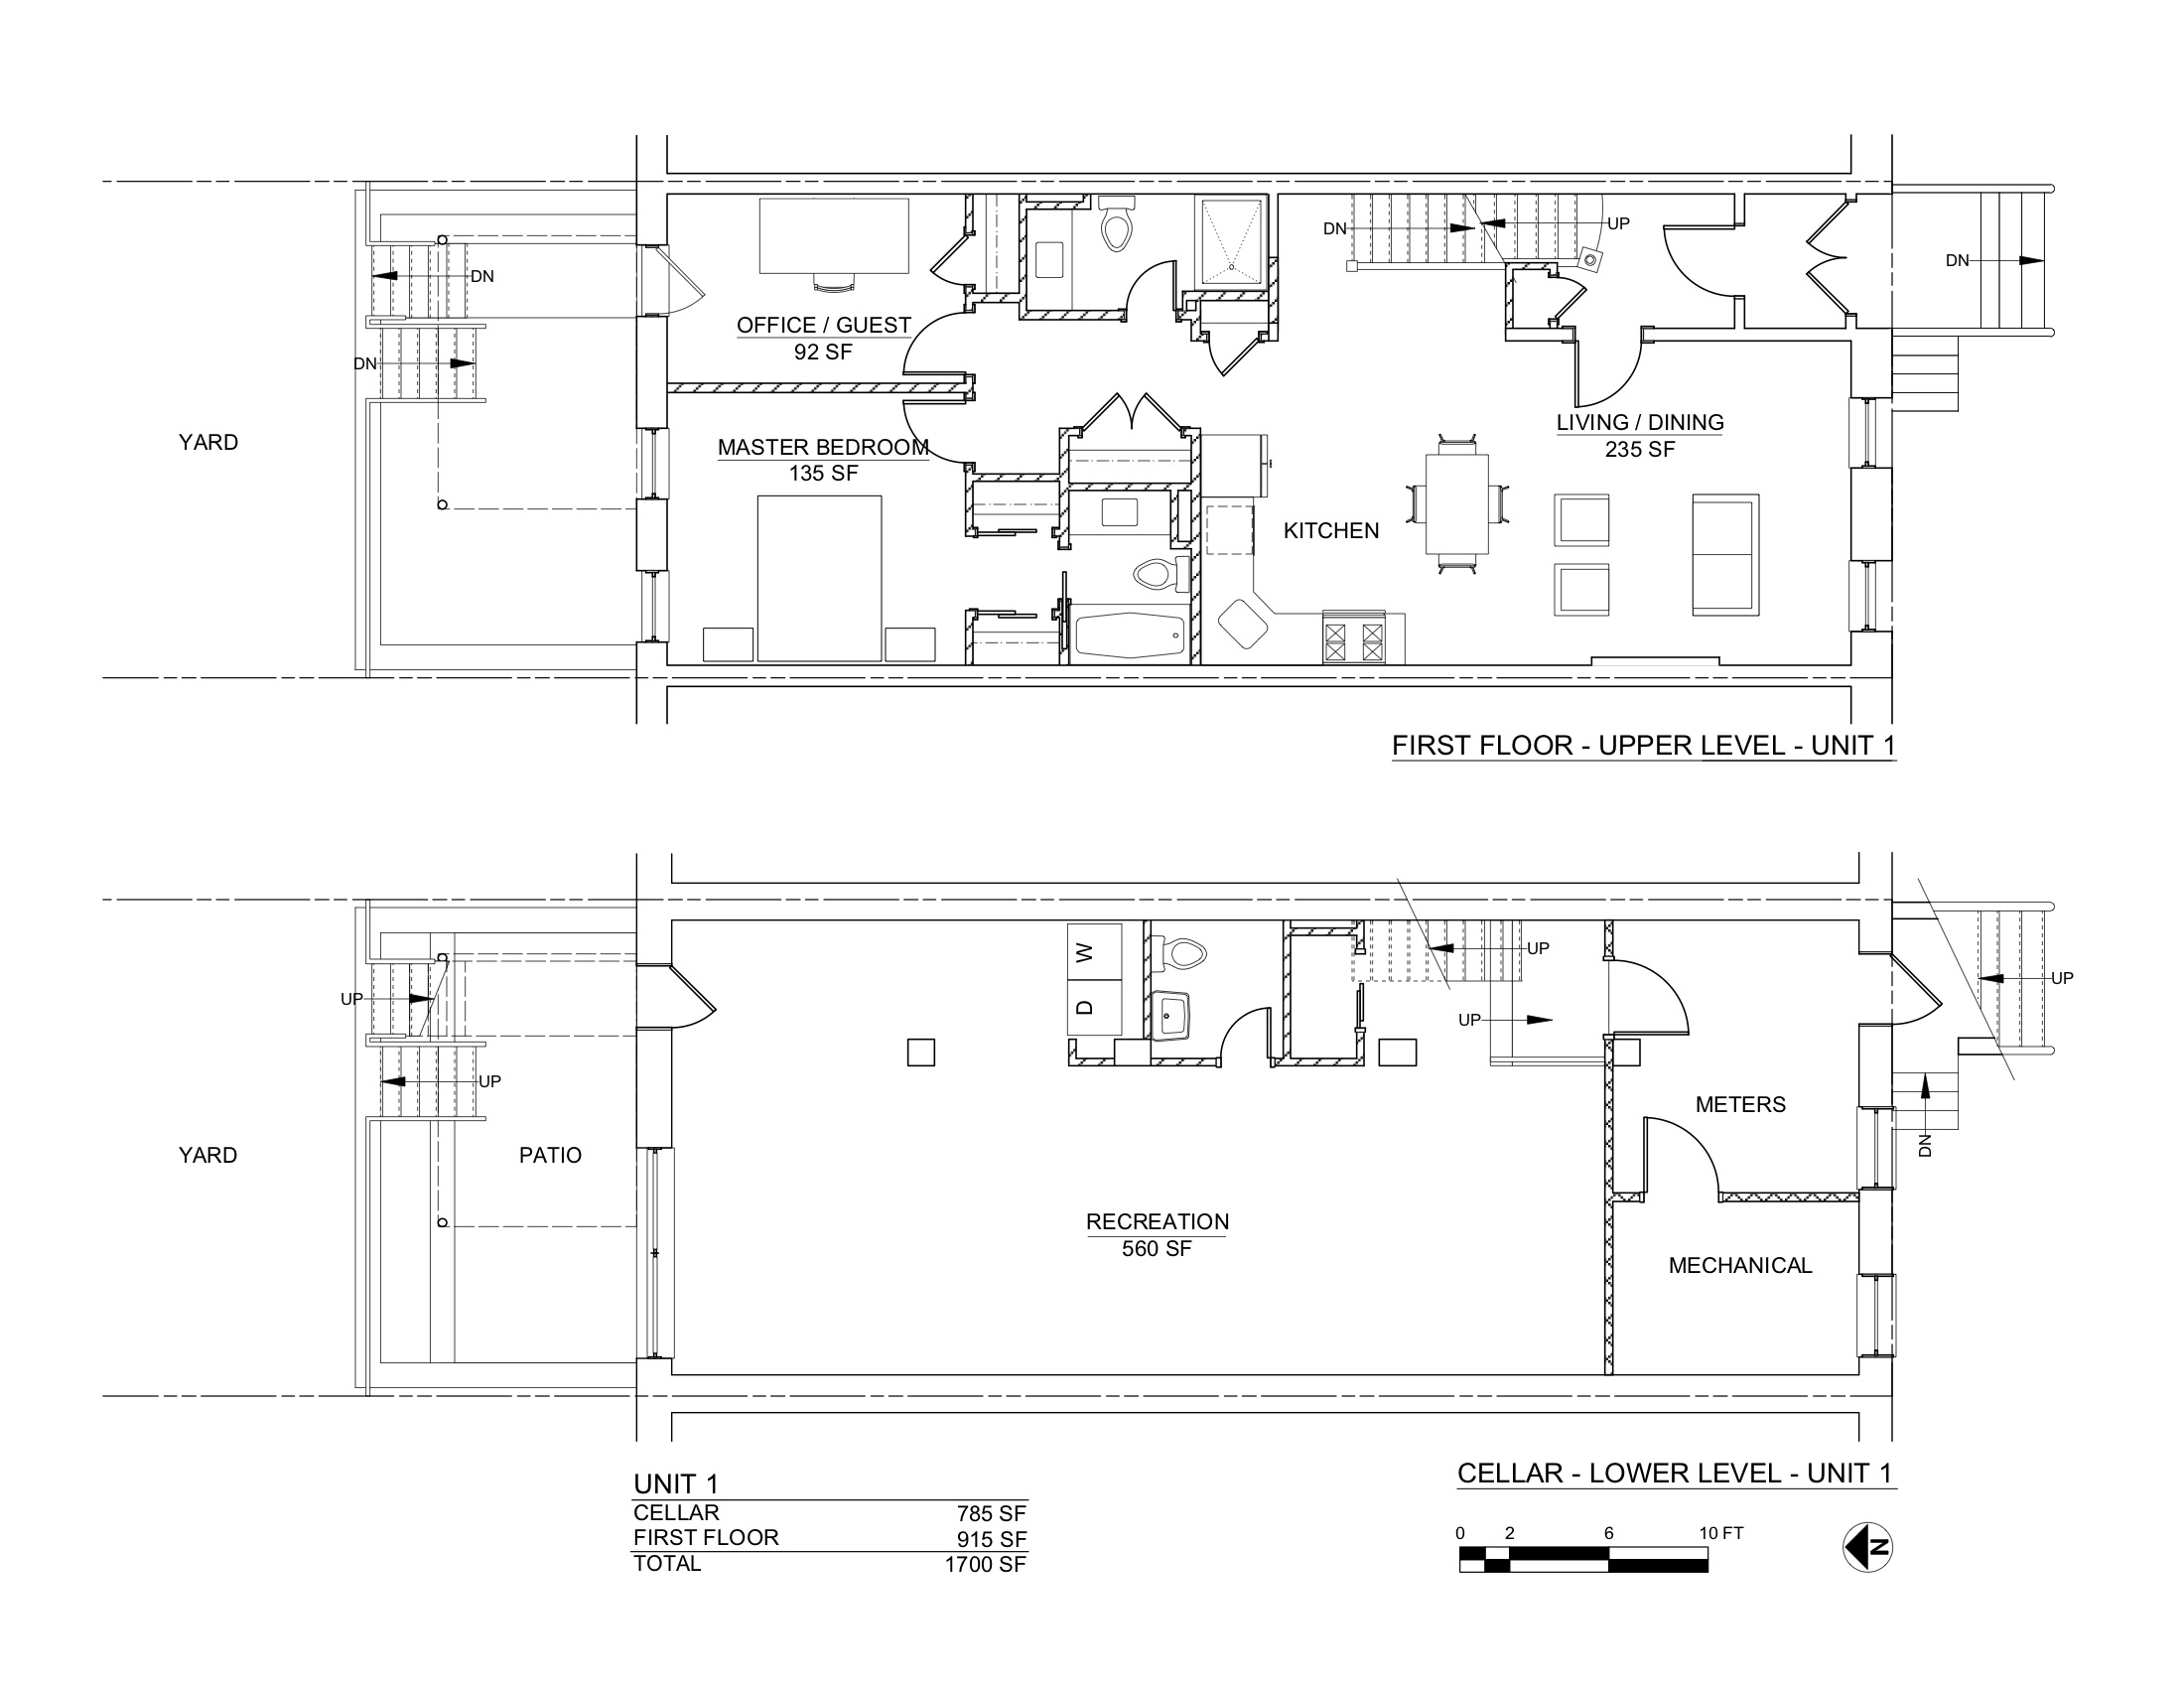 CARROLL STREET PLANS CELLAR & 1ST FLOORS